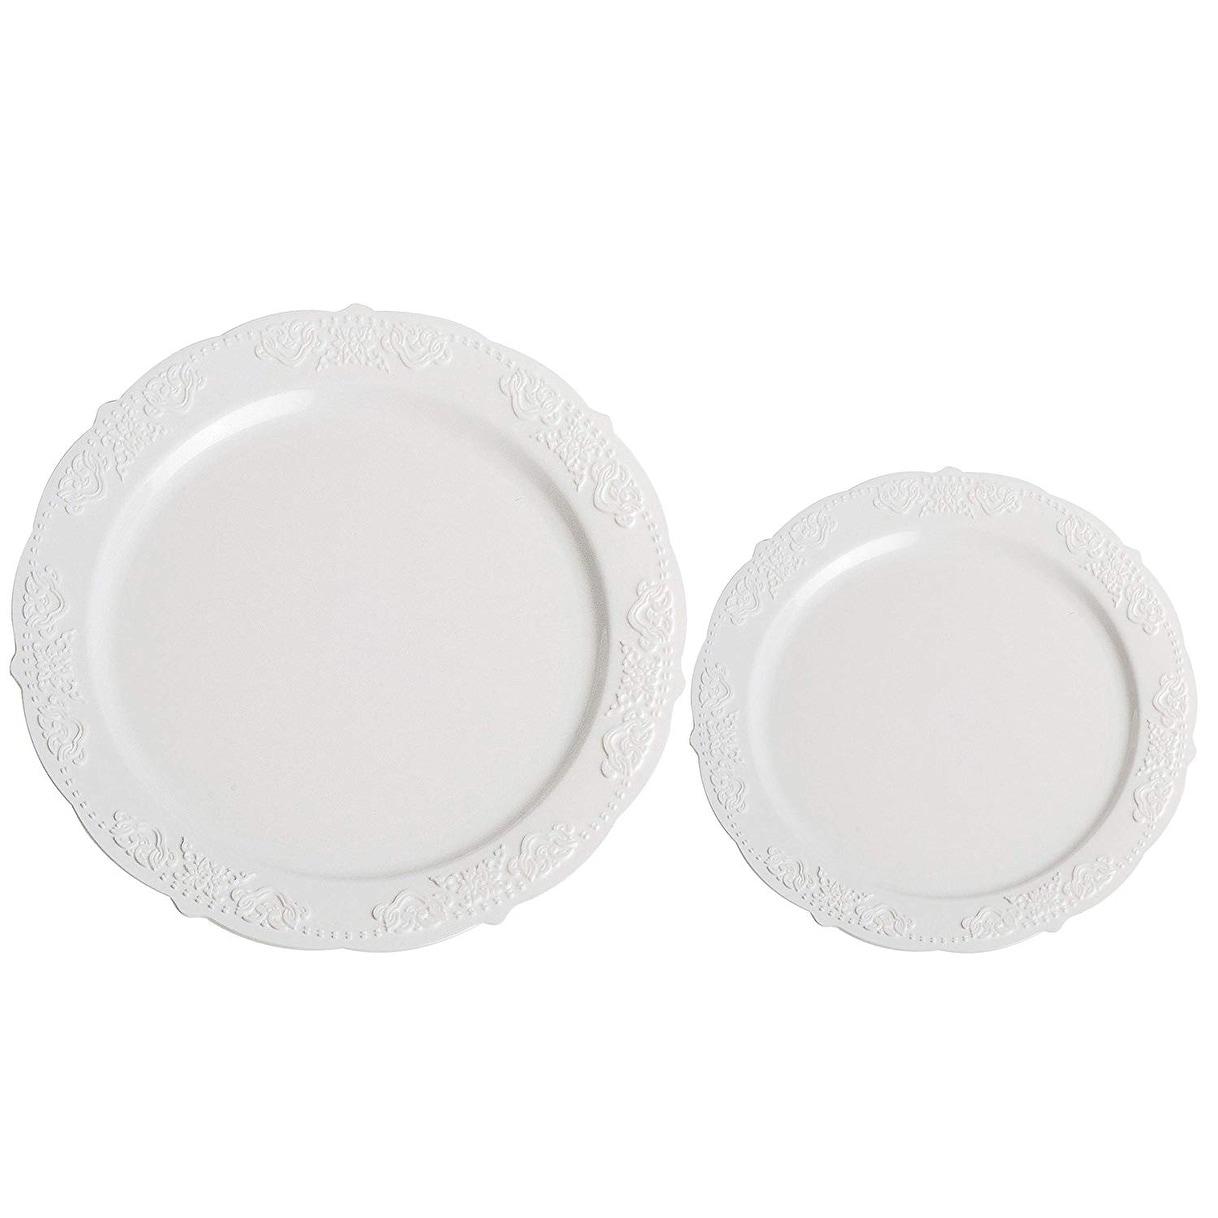 Party Joy 200 Piece Royale Plastic Plate Set 100 Salad Plates 100 Dinner Plates Heavy Duty Premium Plastic Plates White Overstock 27165902